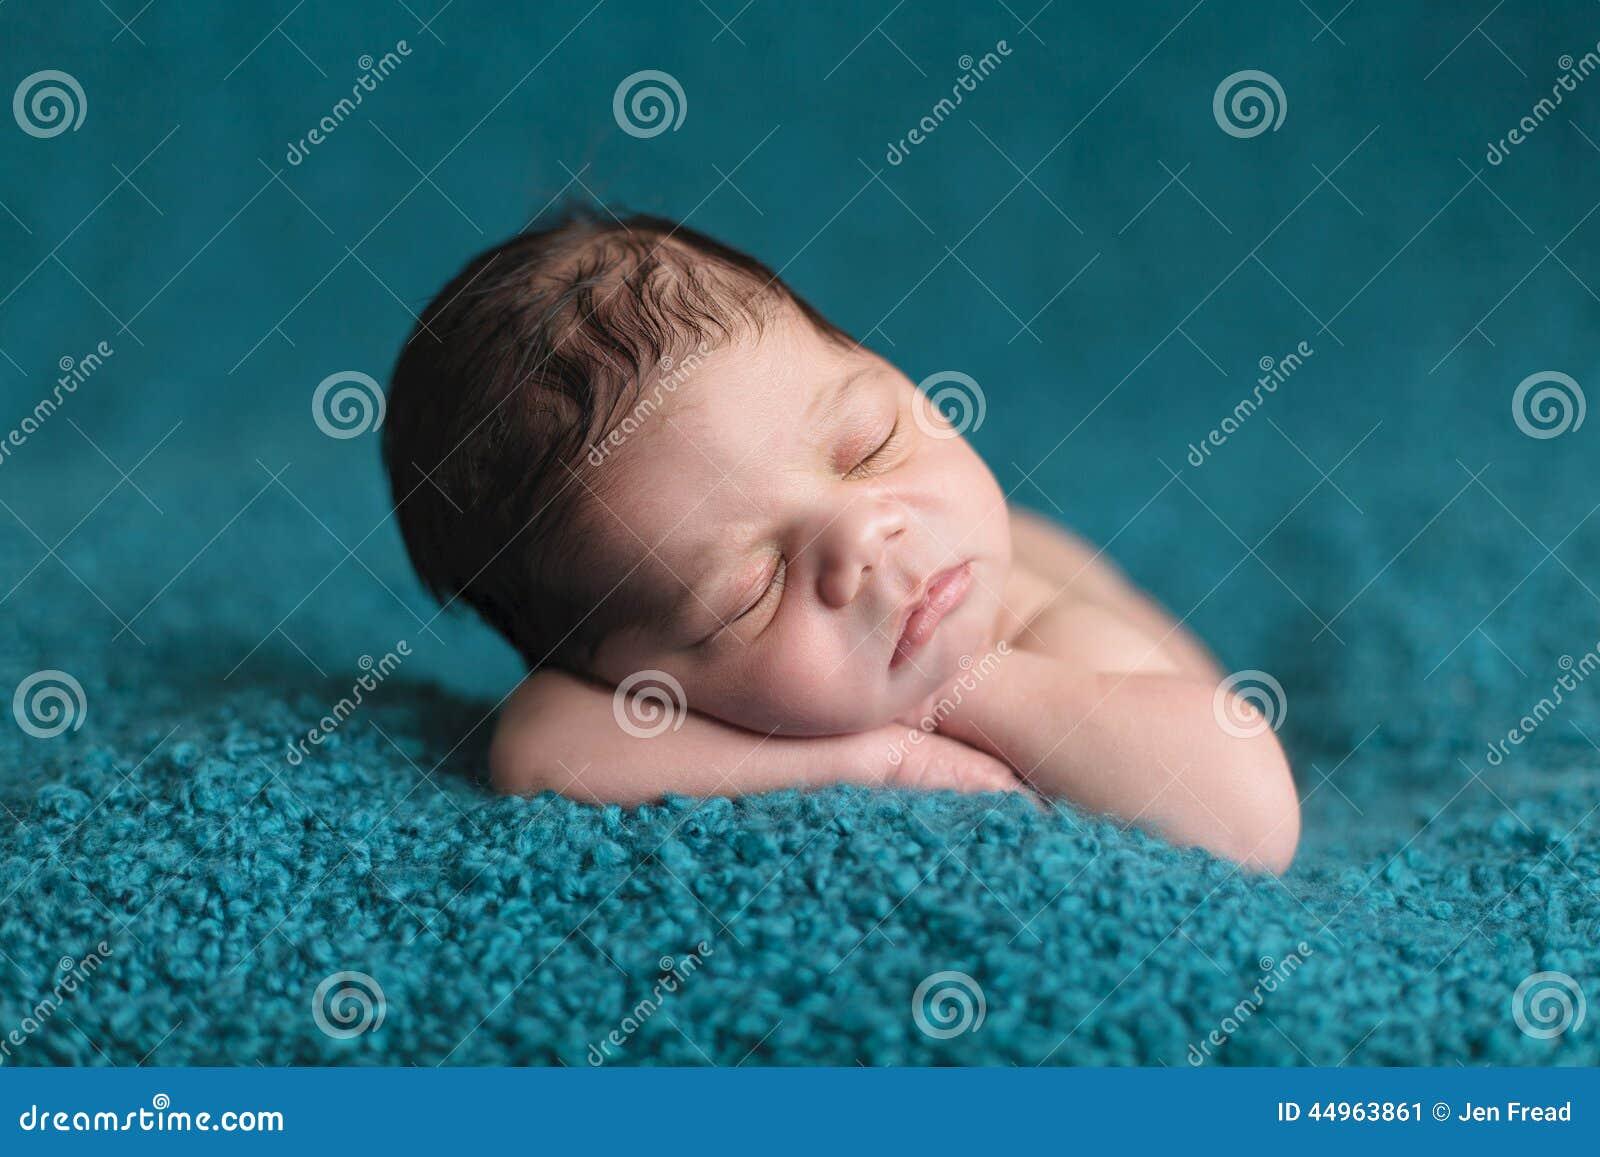 Newborn Baby Falling Asleep Stock Image - Image of